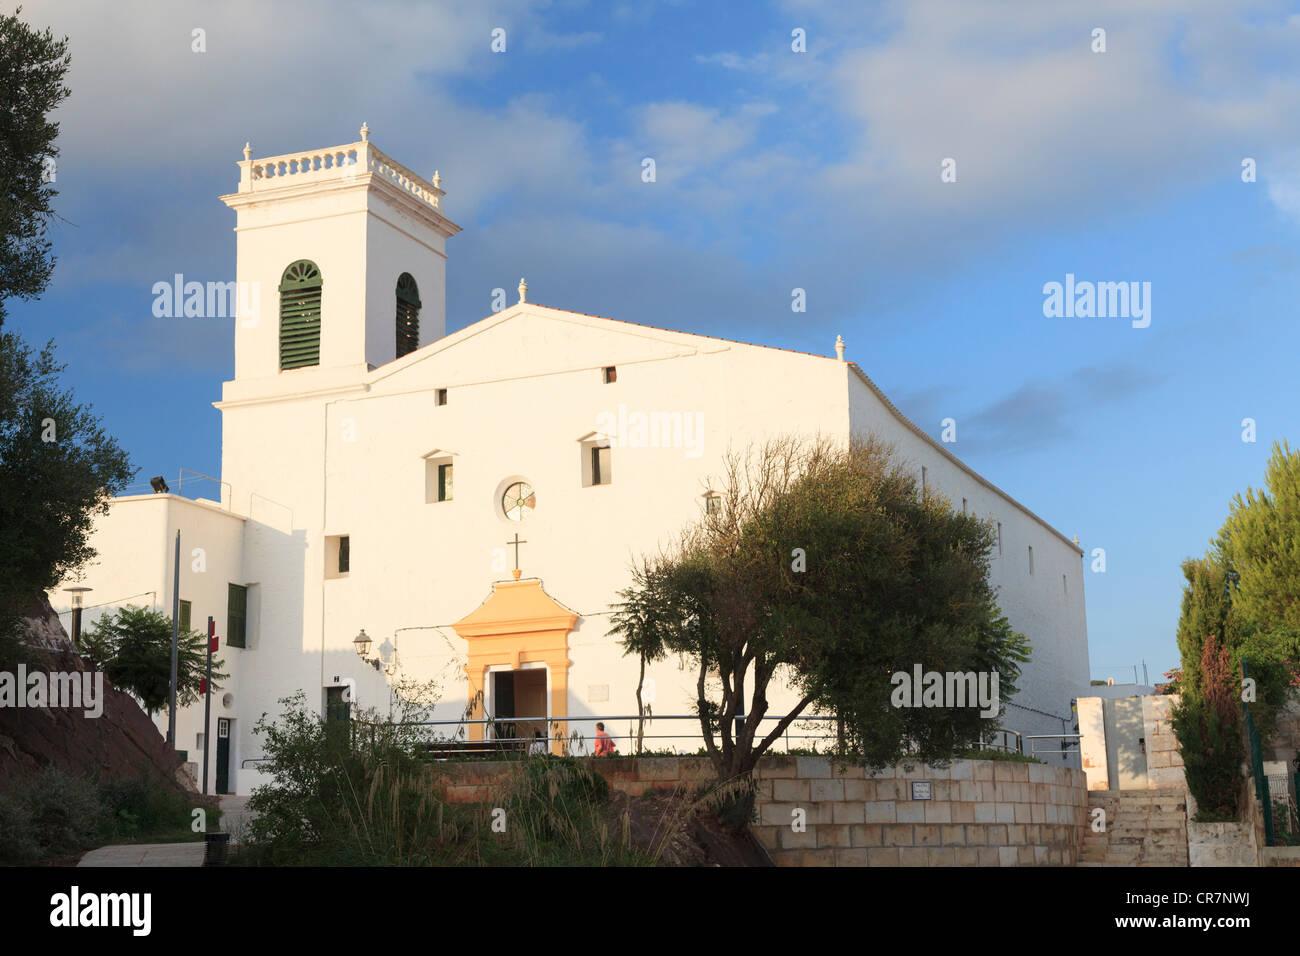 Spain, Balearic Islands, Menorca, Es Mercadal Historic Village, San Martin Church - Stock Image